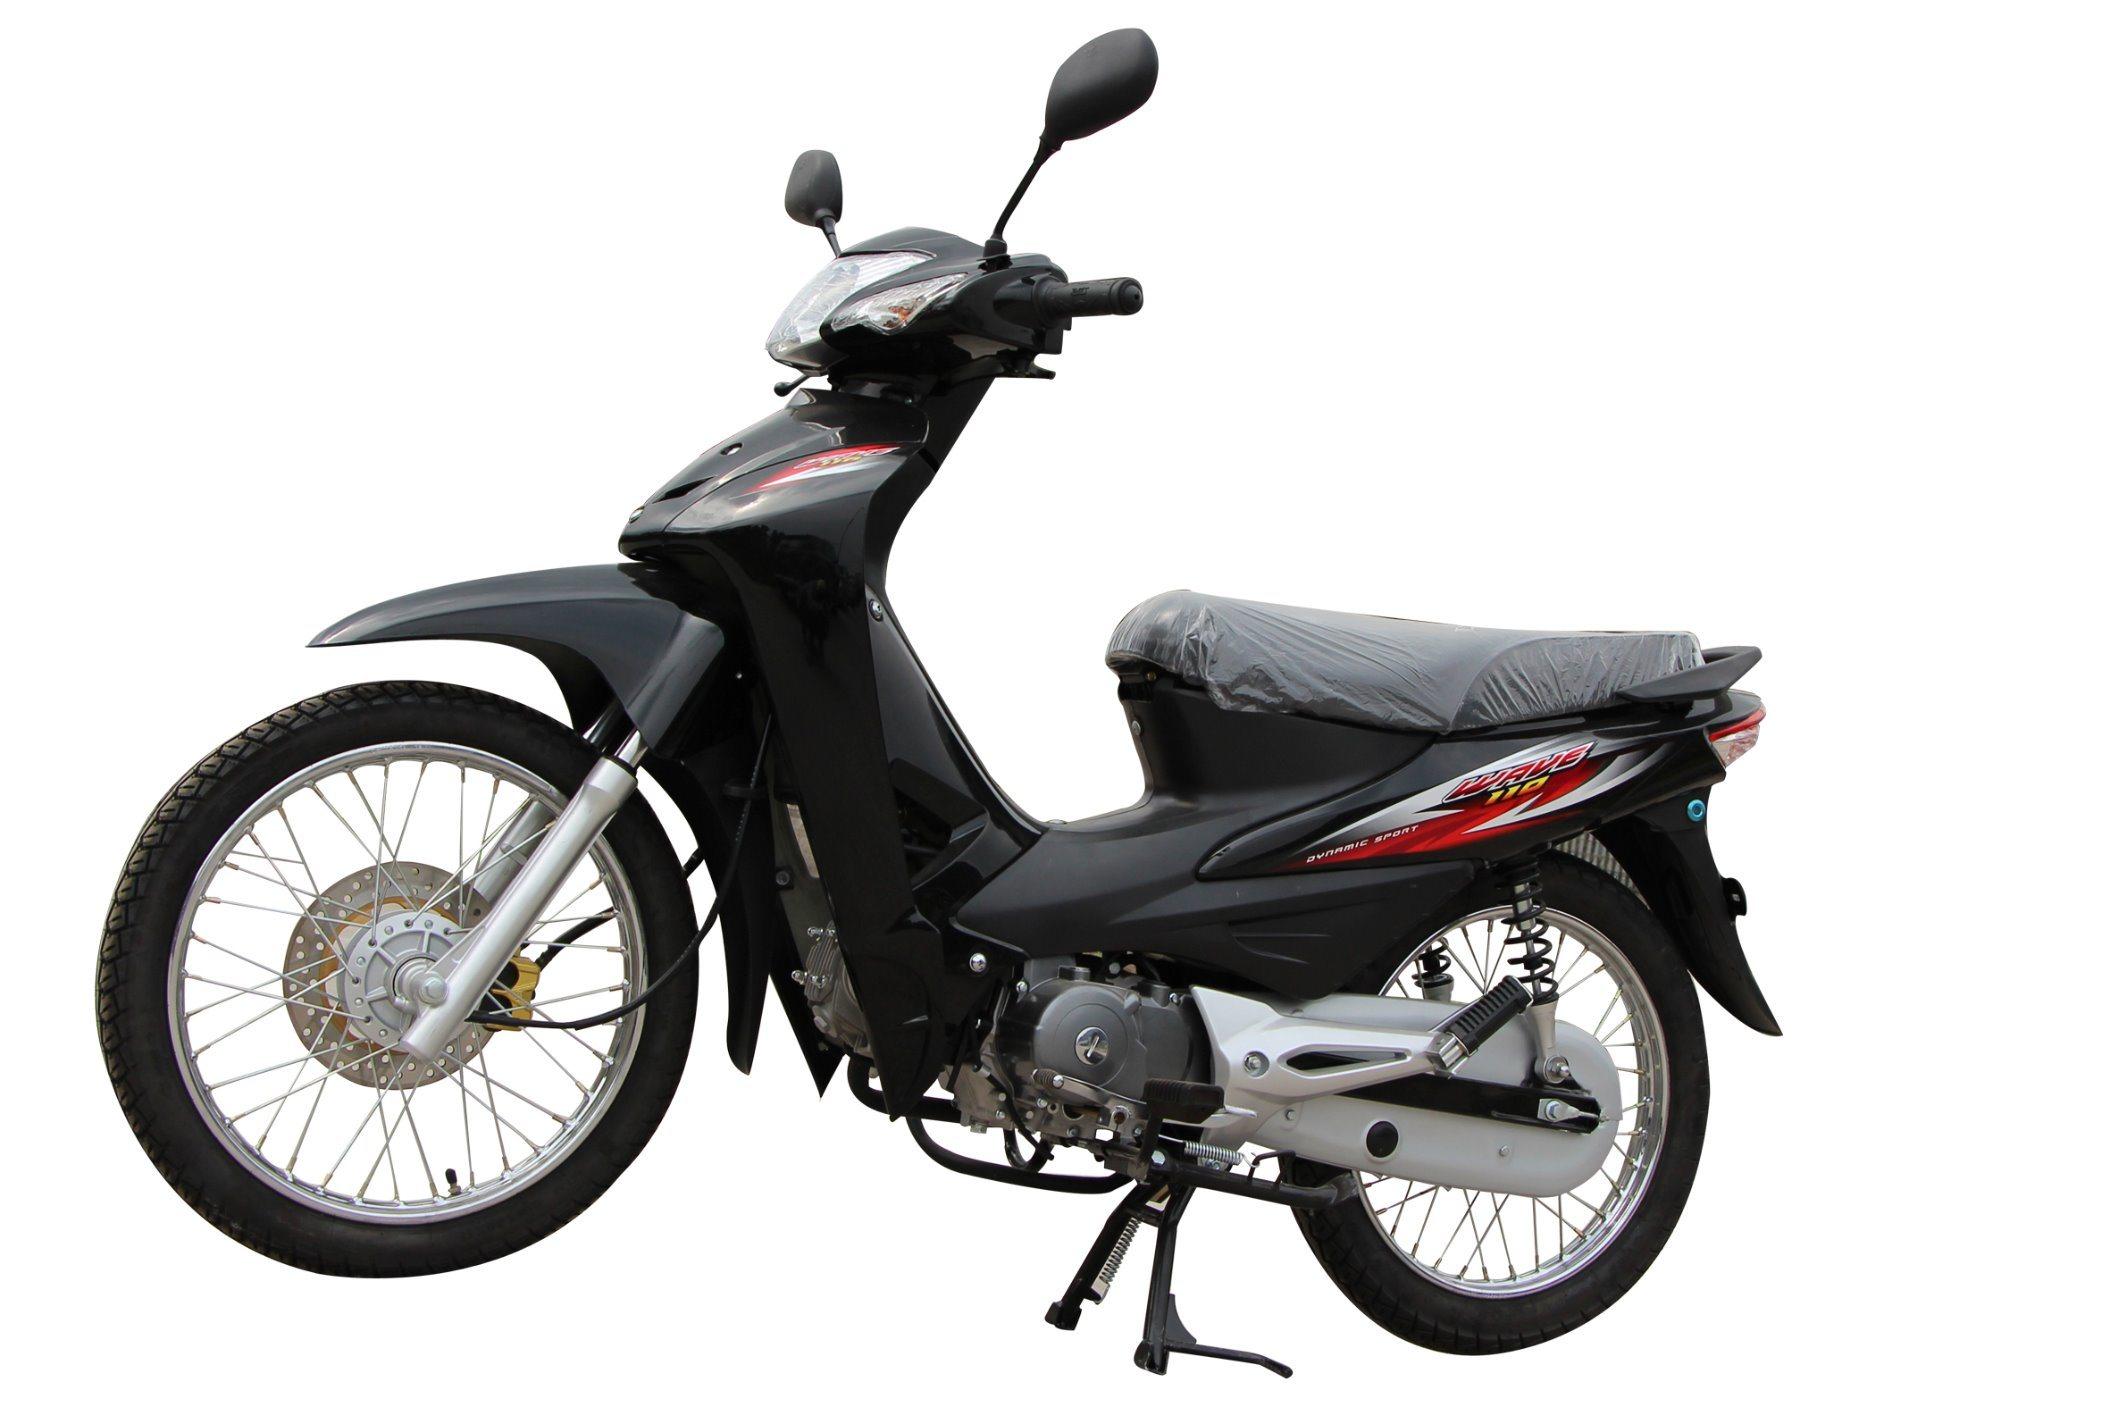 110cc Cub